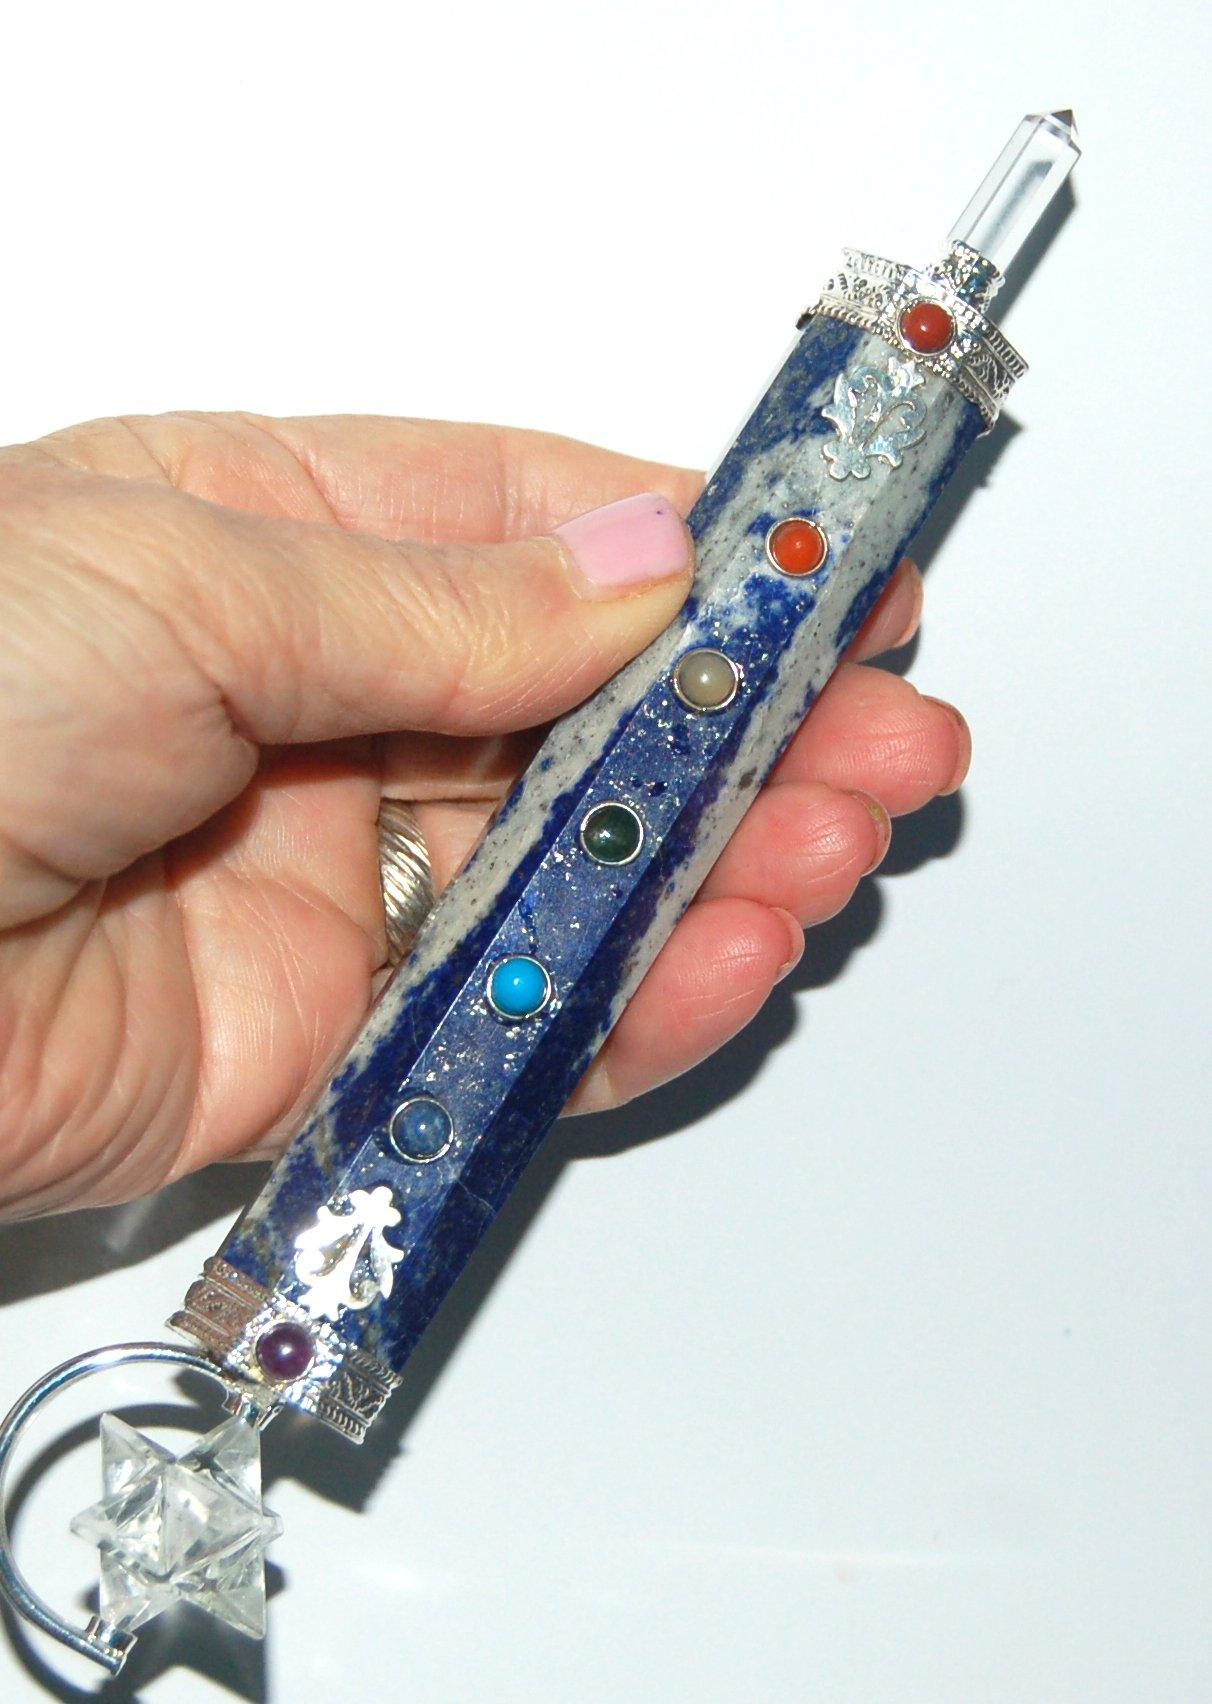 Large Beautiful Ornate Lapis Lazuli Merkabah Merkaba Healing Chakra Wand by Healing Crystals India